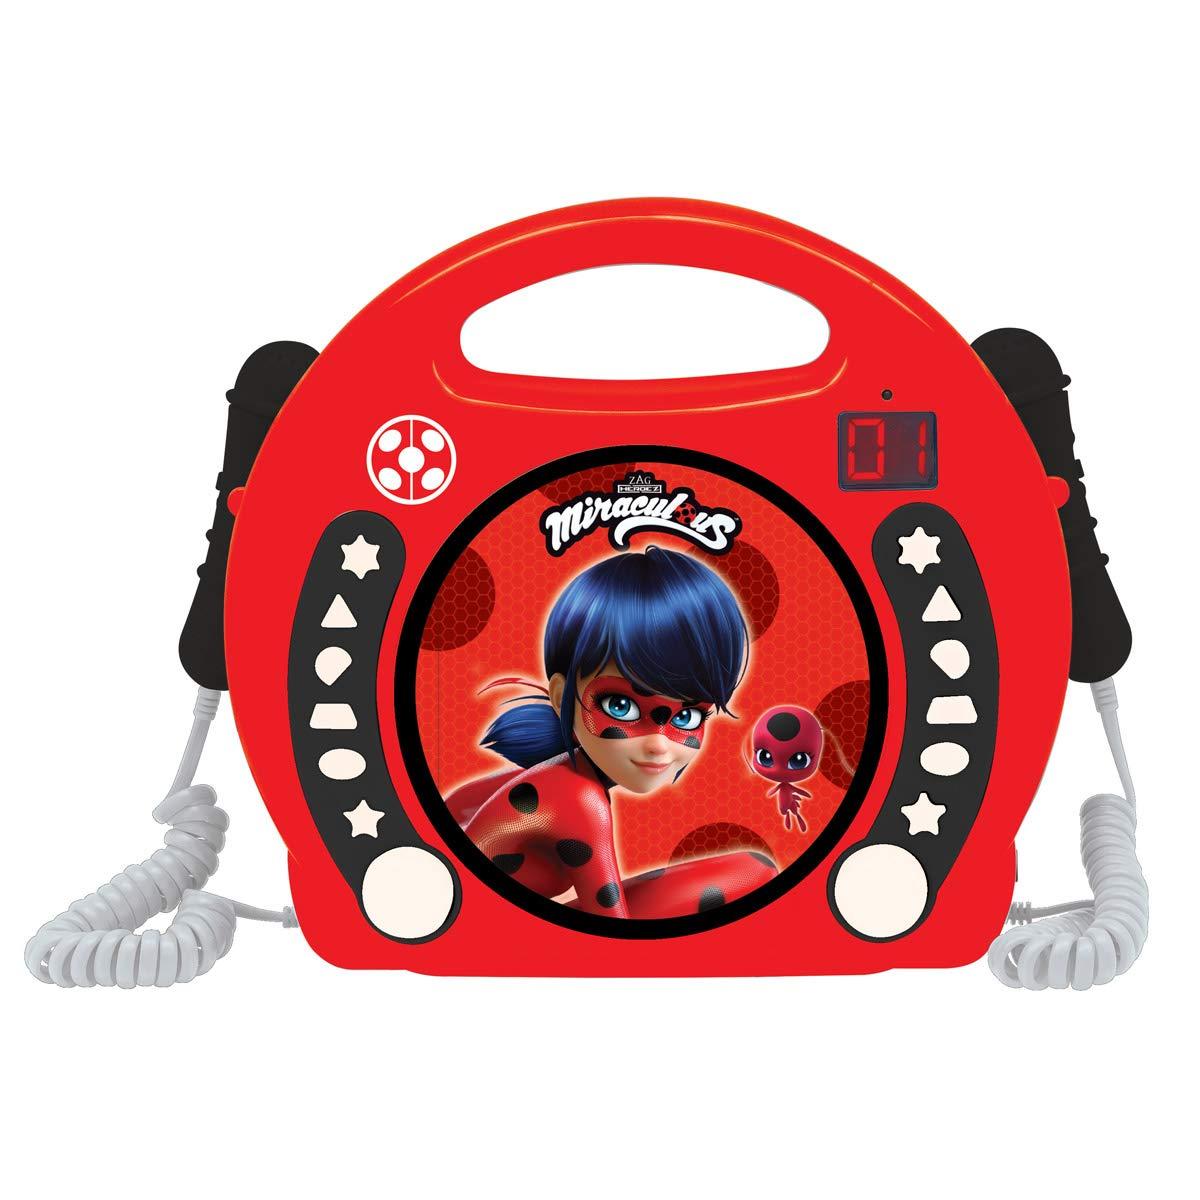 LEXiBOOK Miraculous Ladybug Radio CD, Programming Function, Headphones Jack, for Kids, with Power Supply or Batteries, Red/Black, RCDK100MI